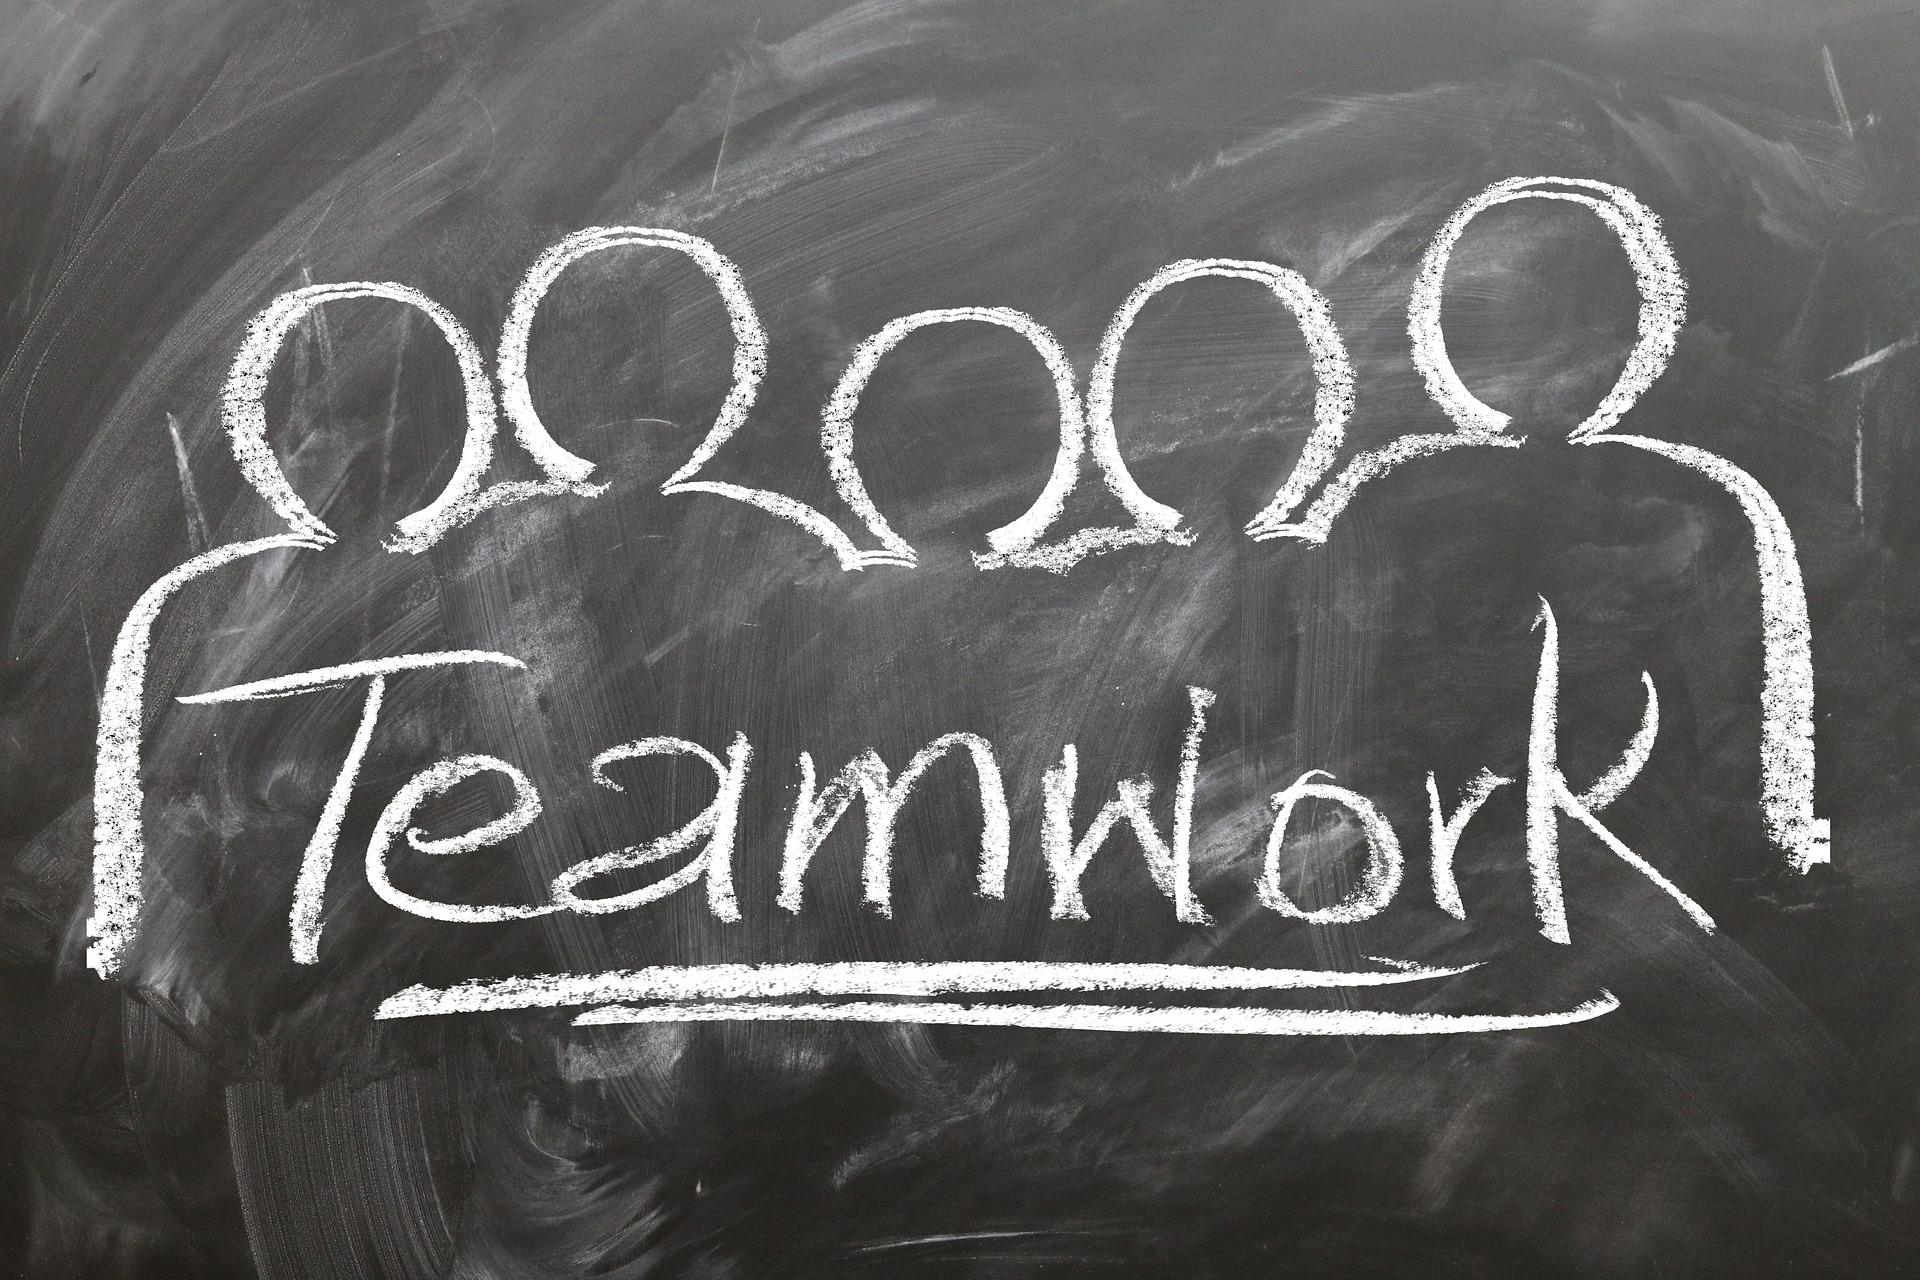 account-based-marketing-smarketing-teamwork